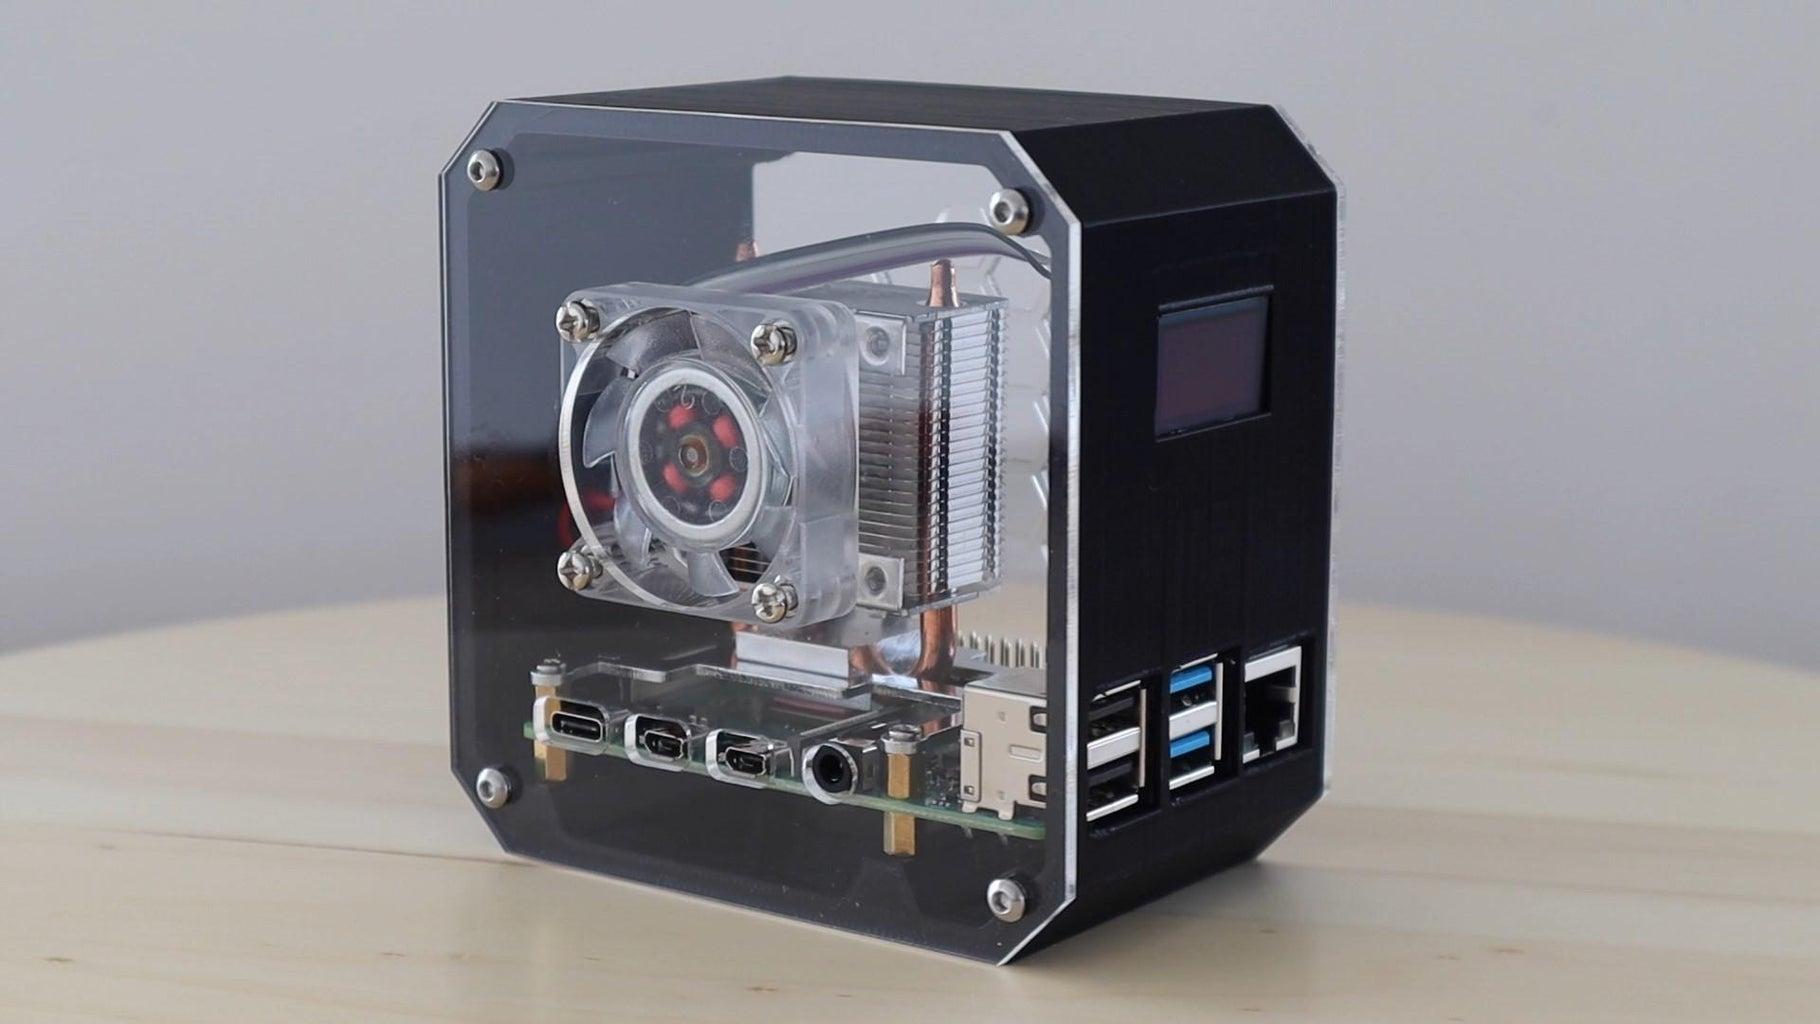 DIY Raspberry Pi Desktop Case With Stats Display